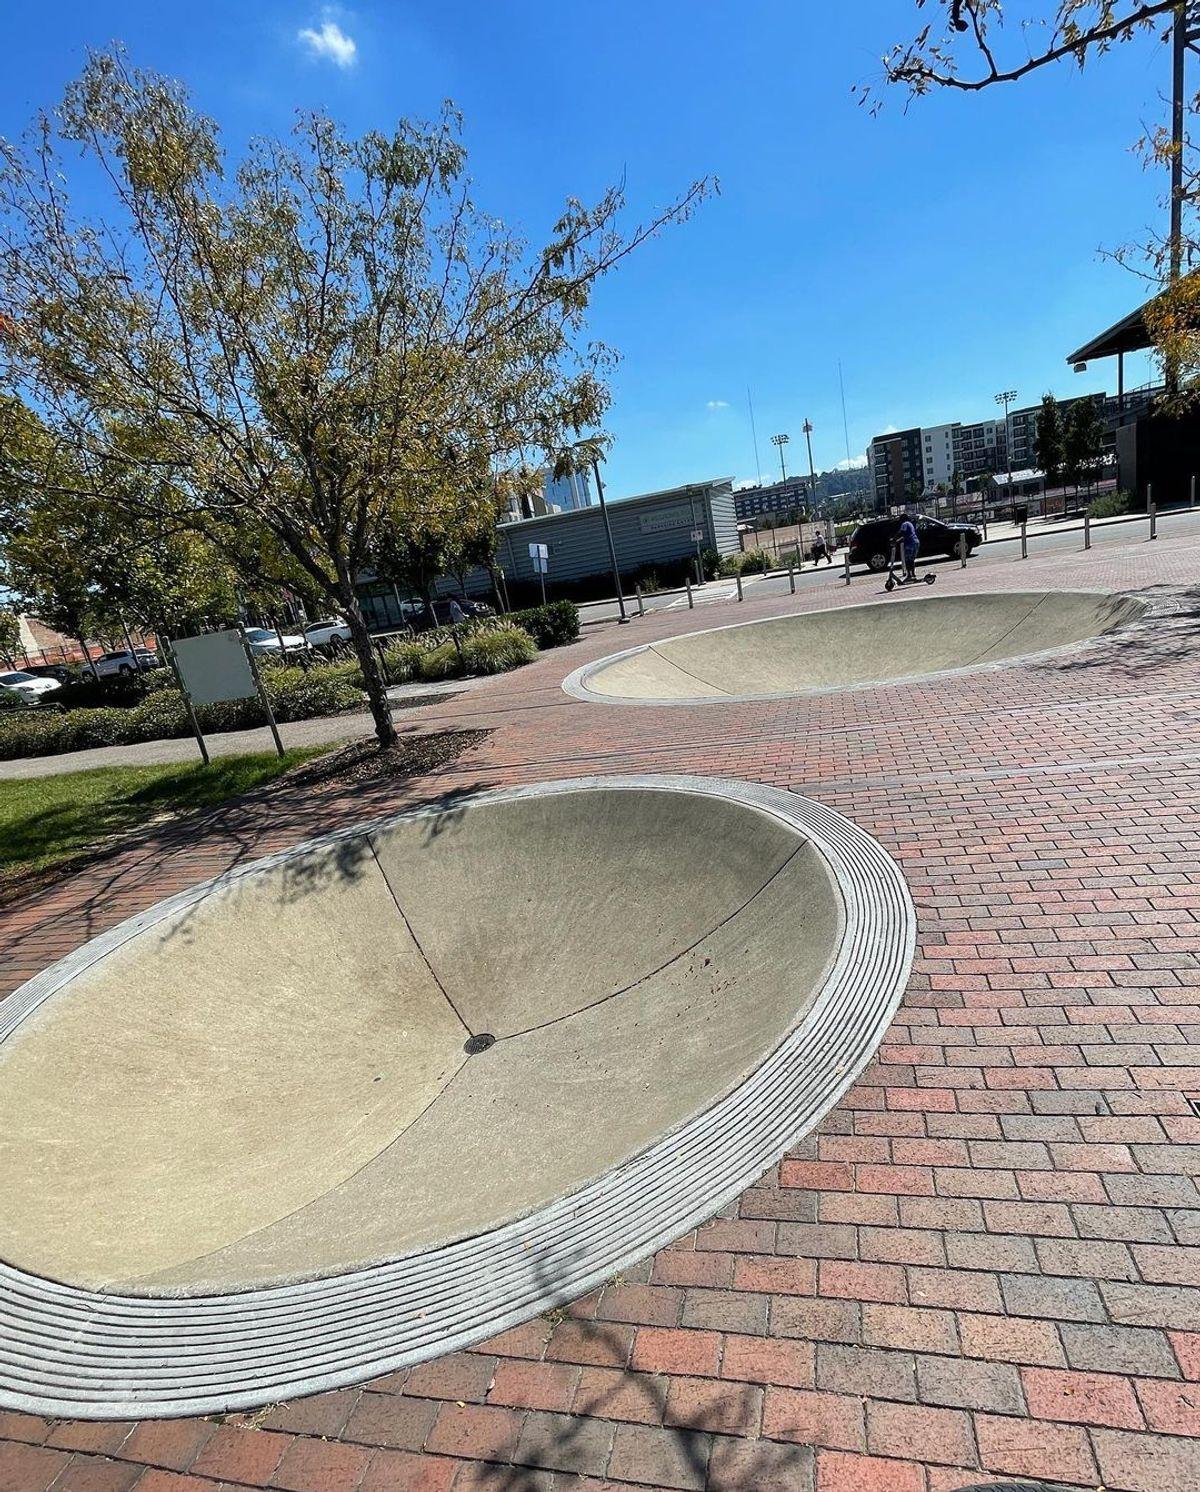 Image for skate spot Railroad Park Foundation - Bowls